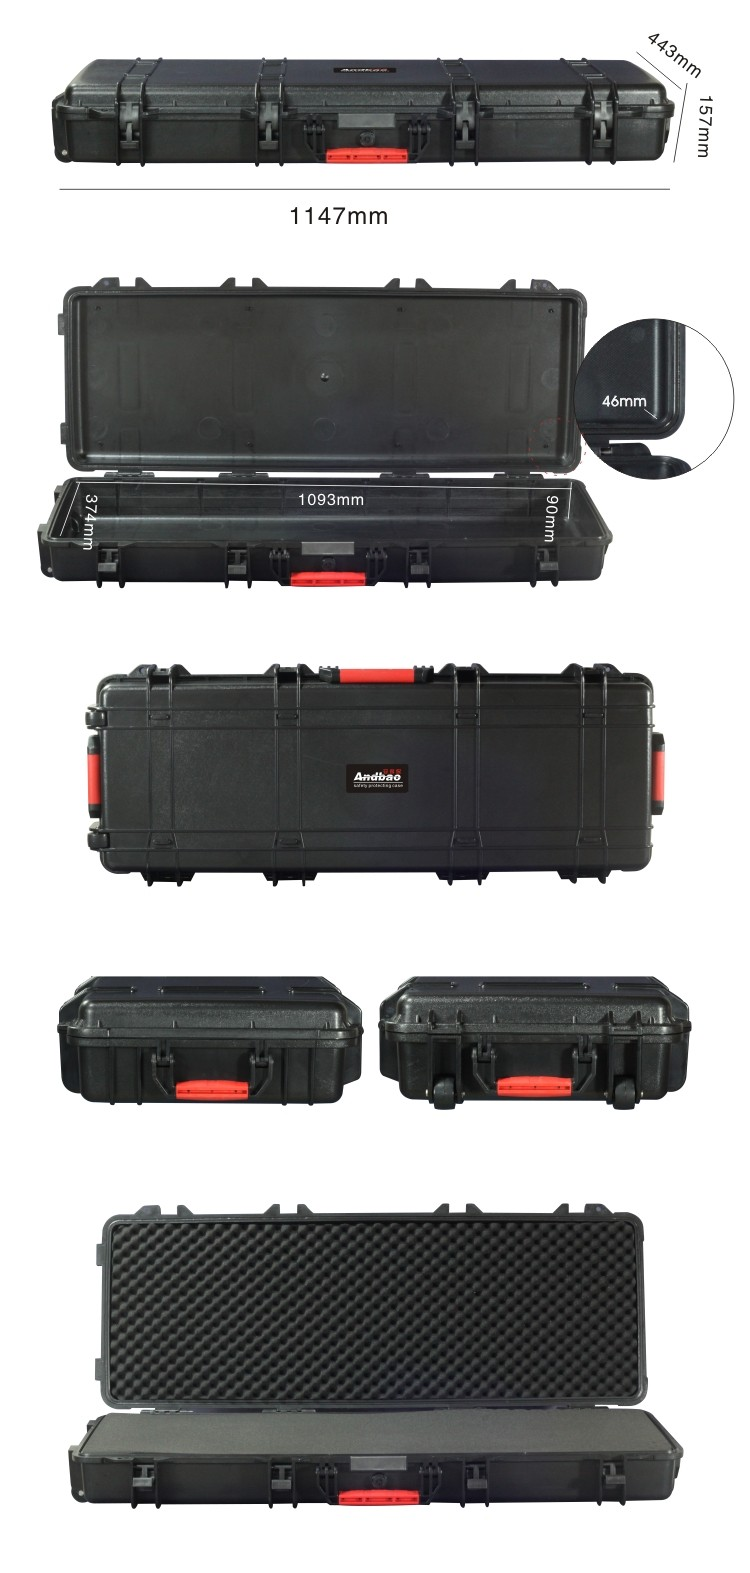 sz-10136-1-2